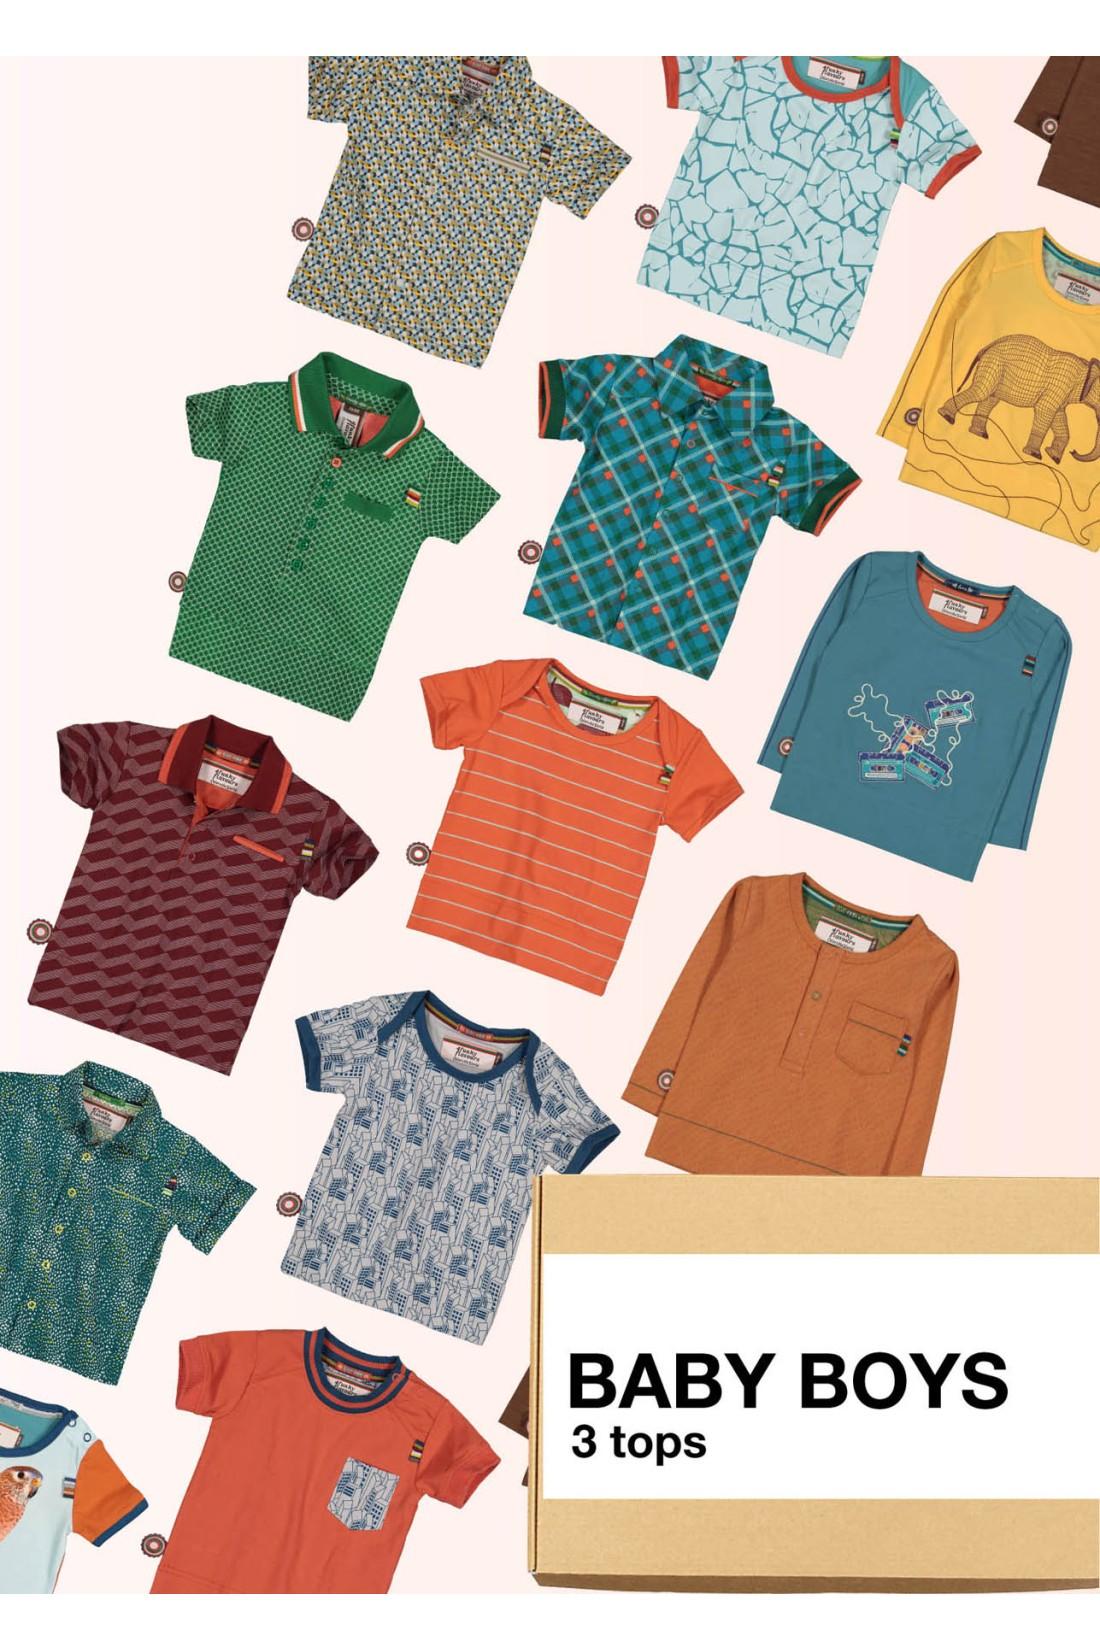 Surprise Box Baby Boy - 3 Tops